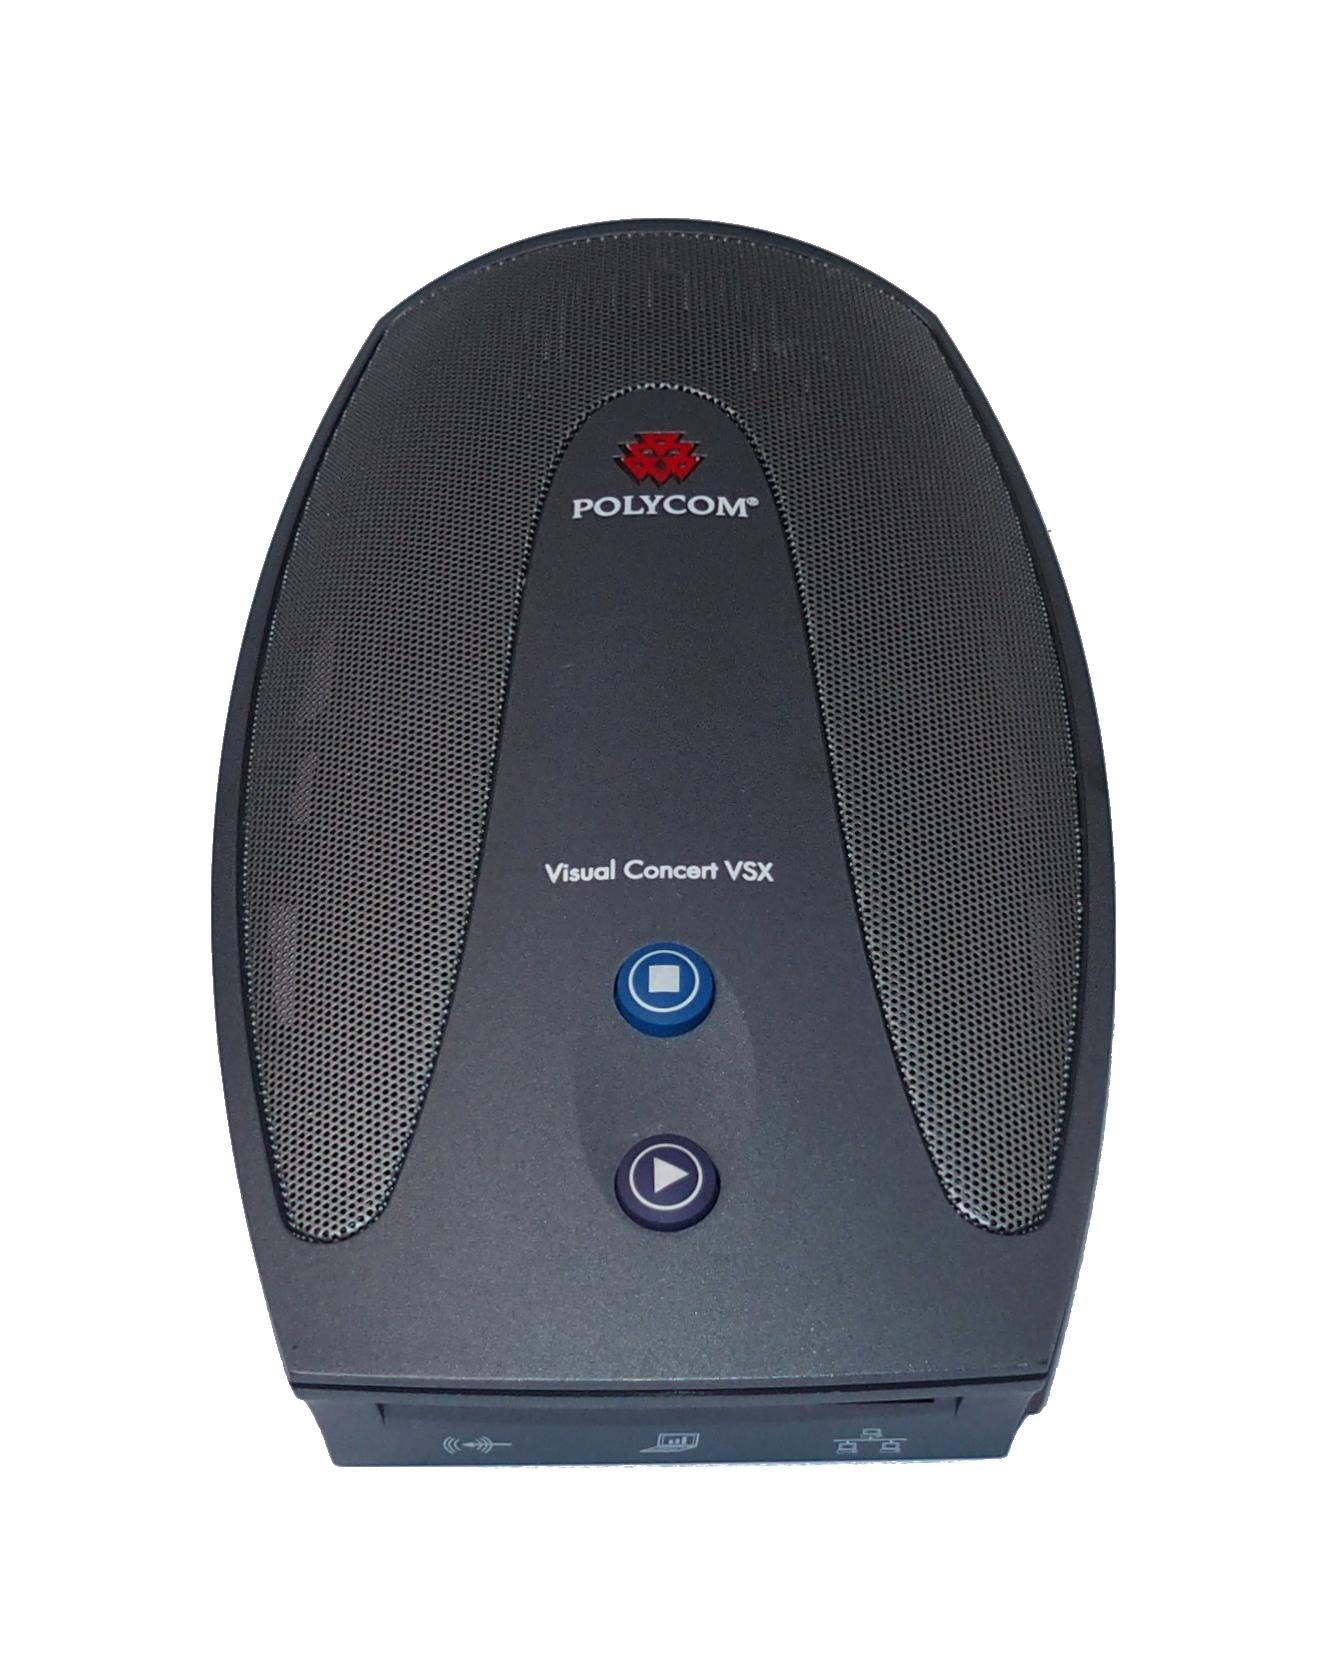 Polycom 2201-20560-002 VSX 7000 Visual Concert VGA Adapter